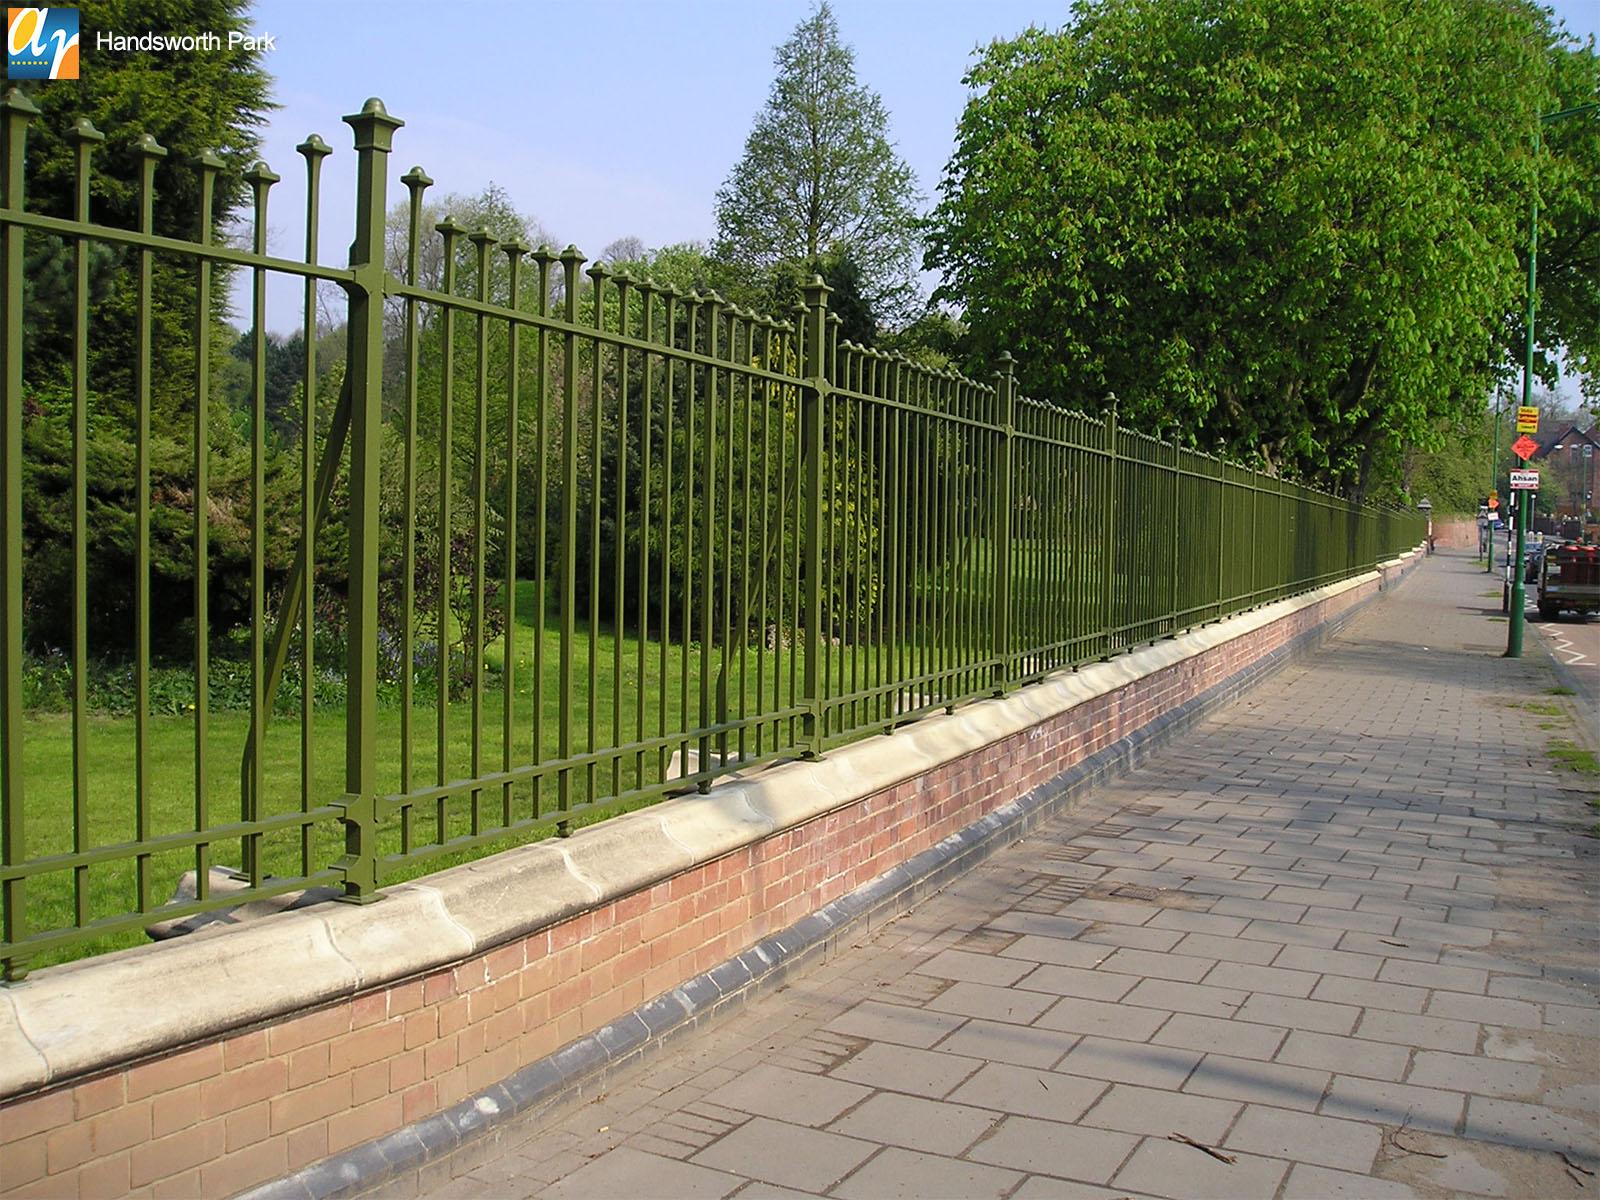 Handsworth Park bespoke metalwork